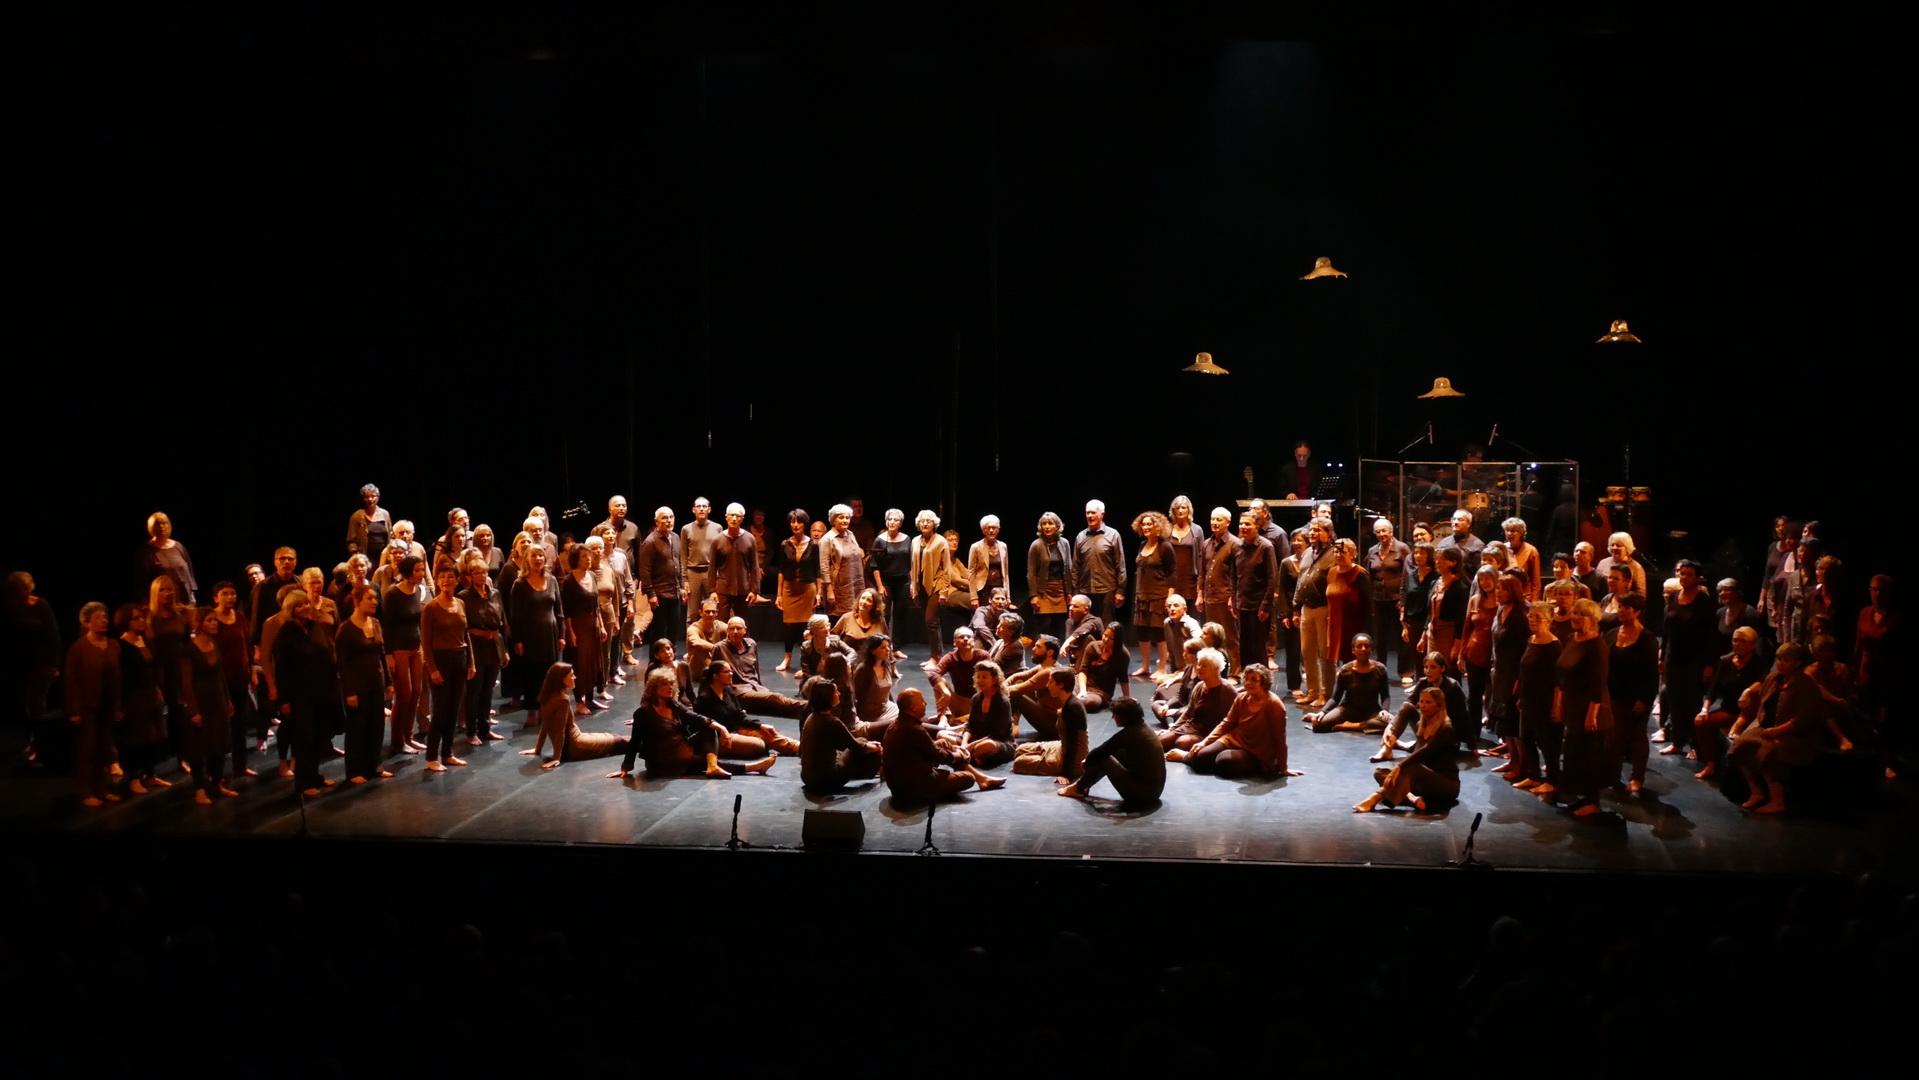 LFDS_concert_ailleurs (1)